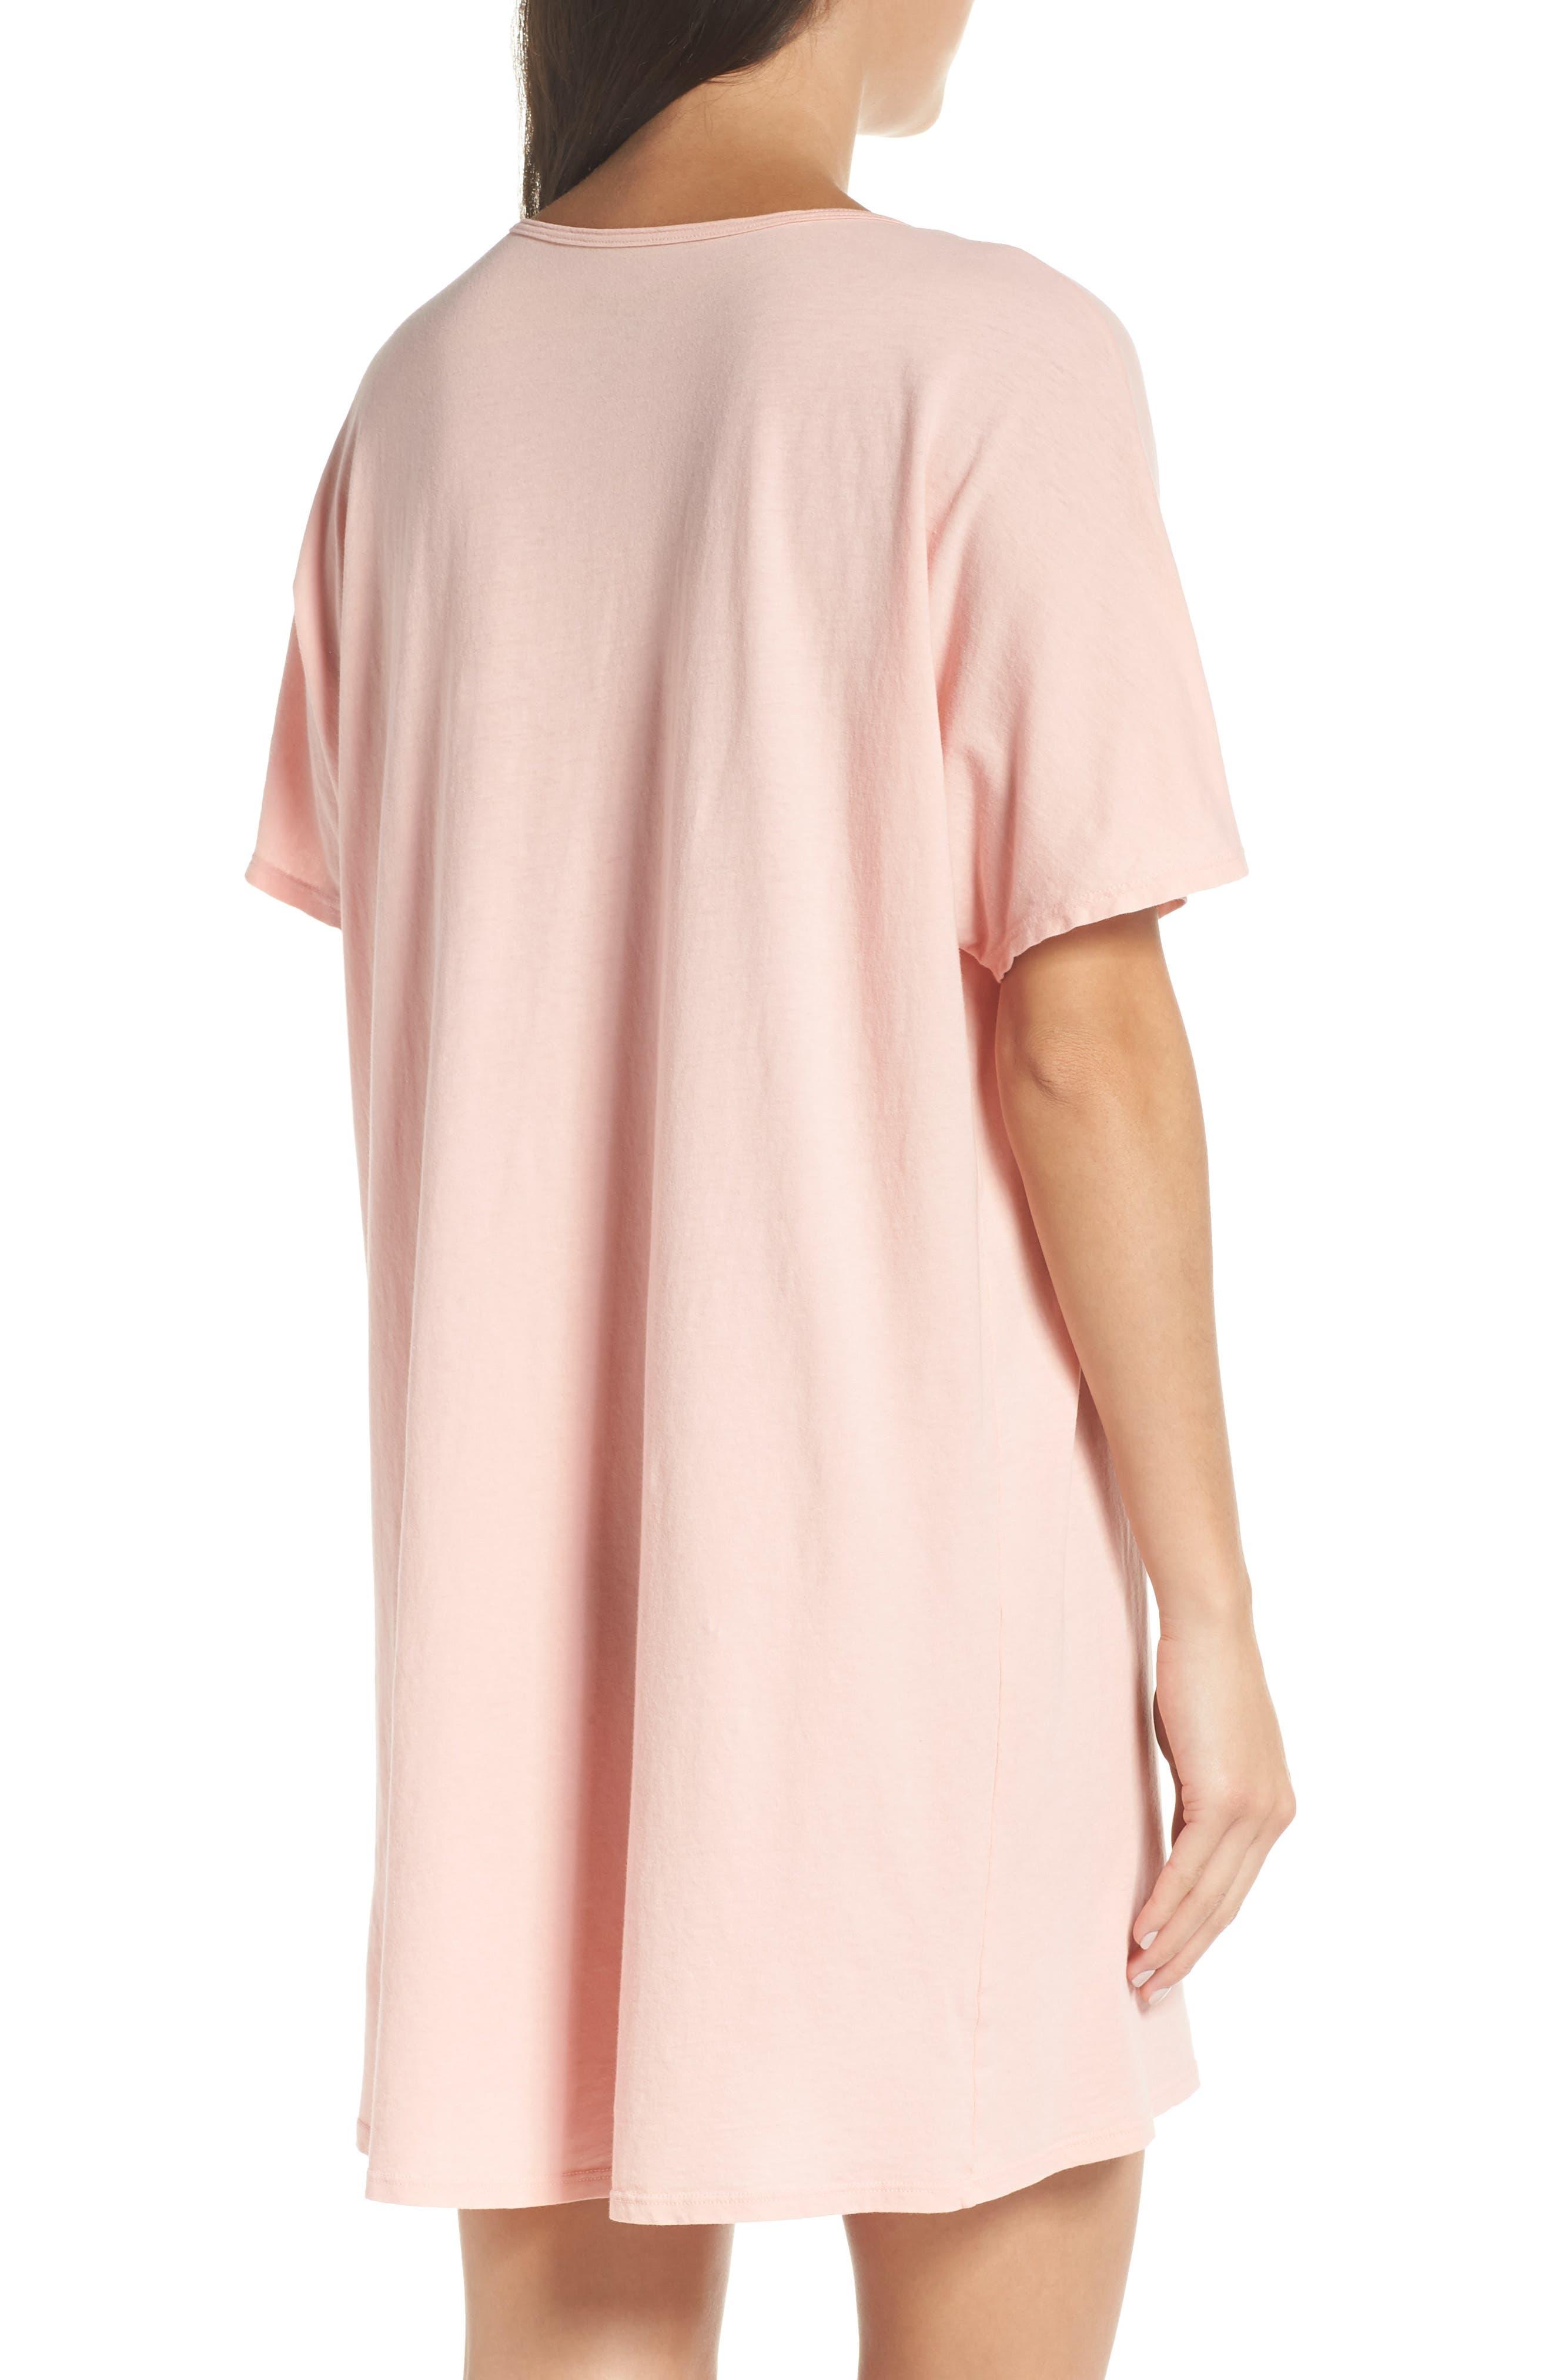 Nightgowns & Nightshirts Bridal & Wedding, Lingerie & Shaping ...